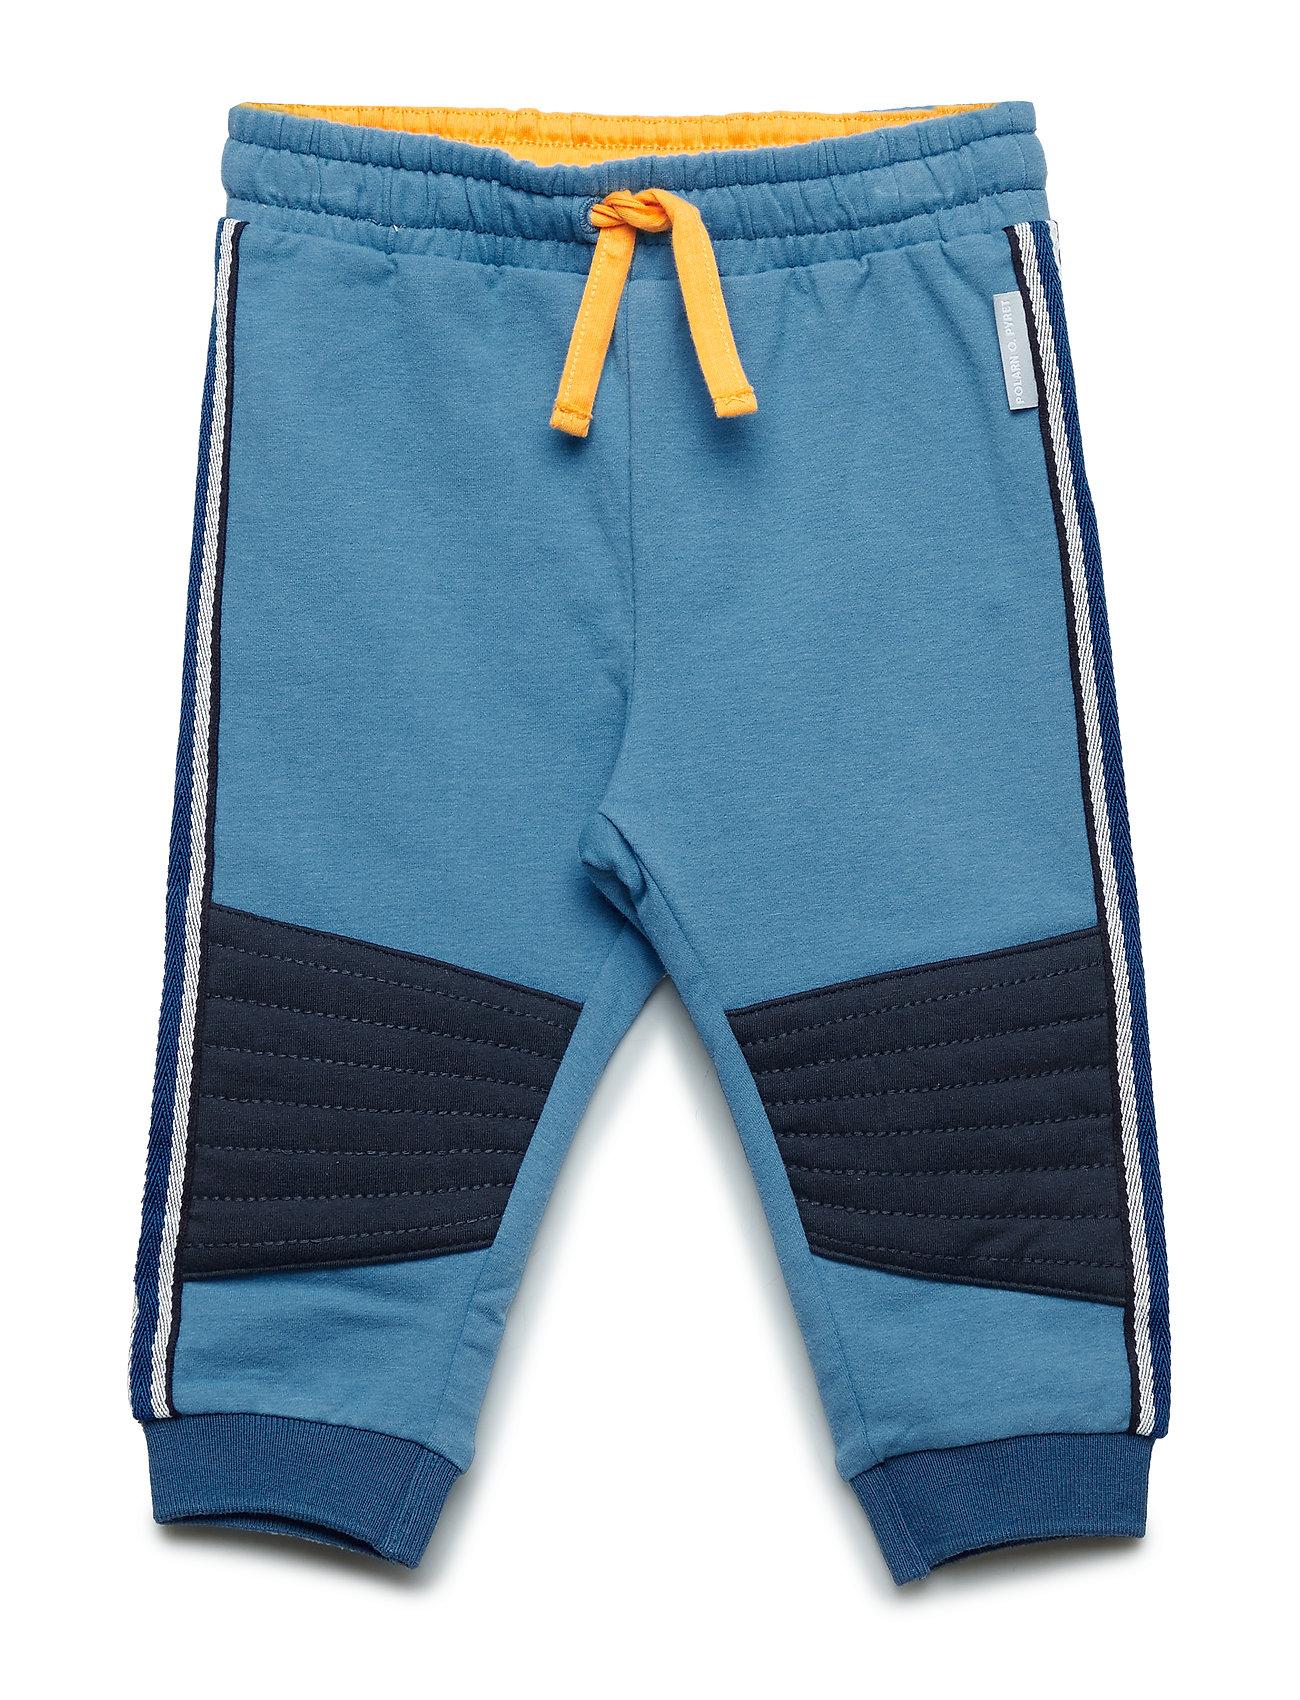 Image of Trouser Jersey Solid Baby Sweatpants Hyggebukser Blå POLARN O. PYRET (3204283195)